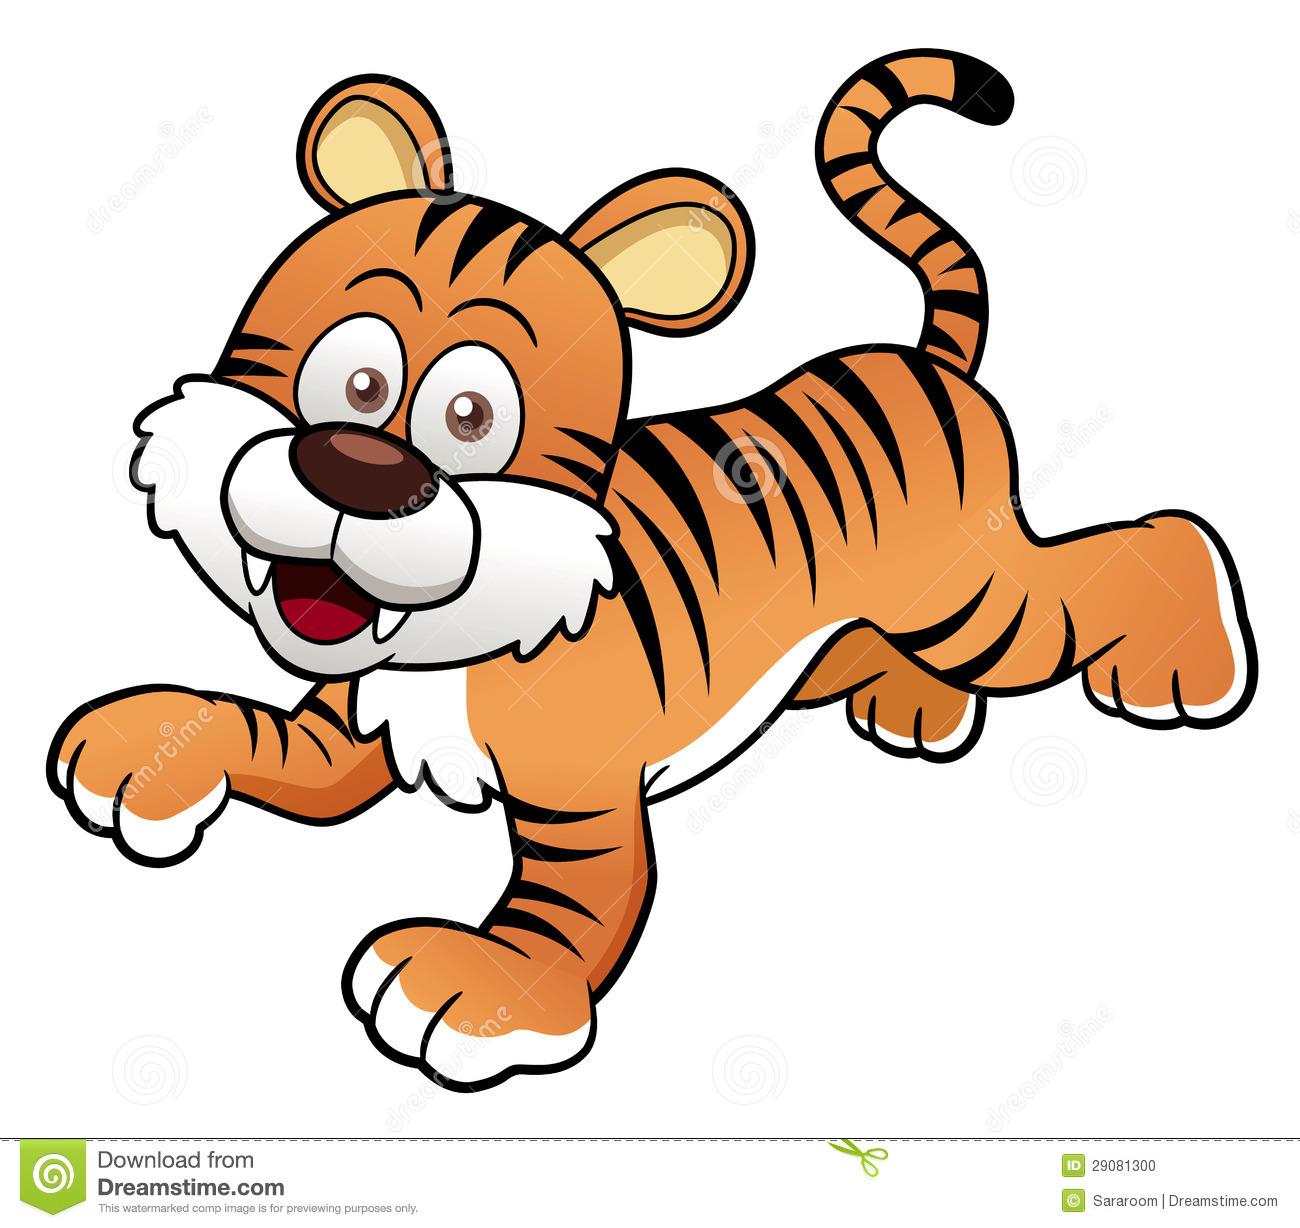 Tiger Images Cartoon   Desktop Backgrounds 1300x1228